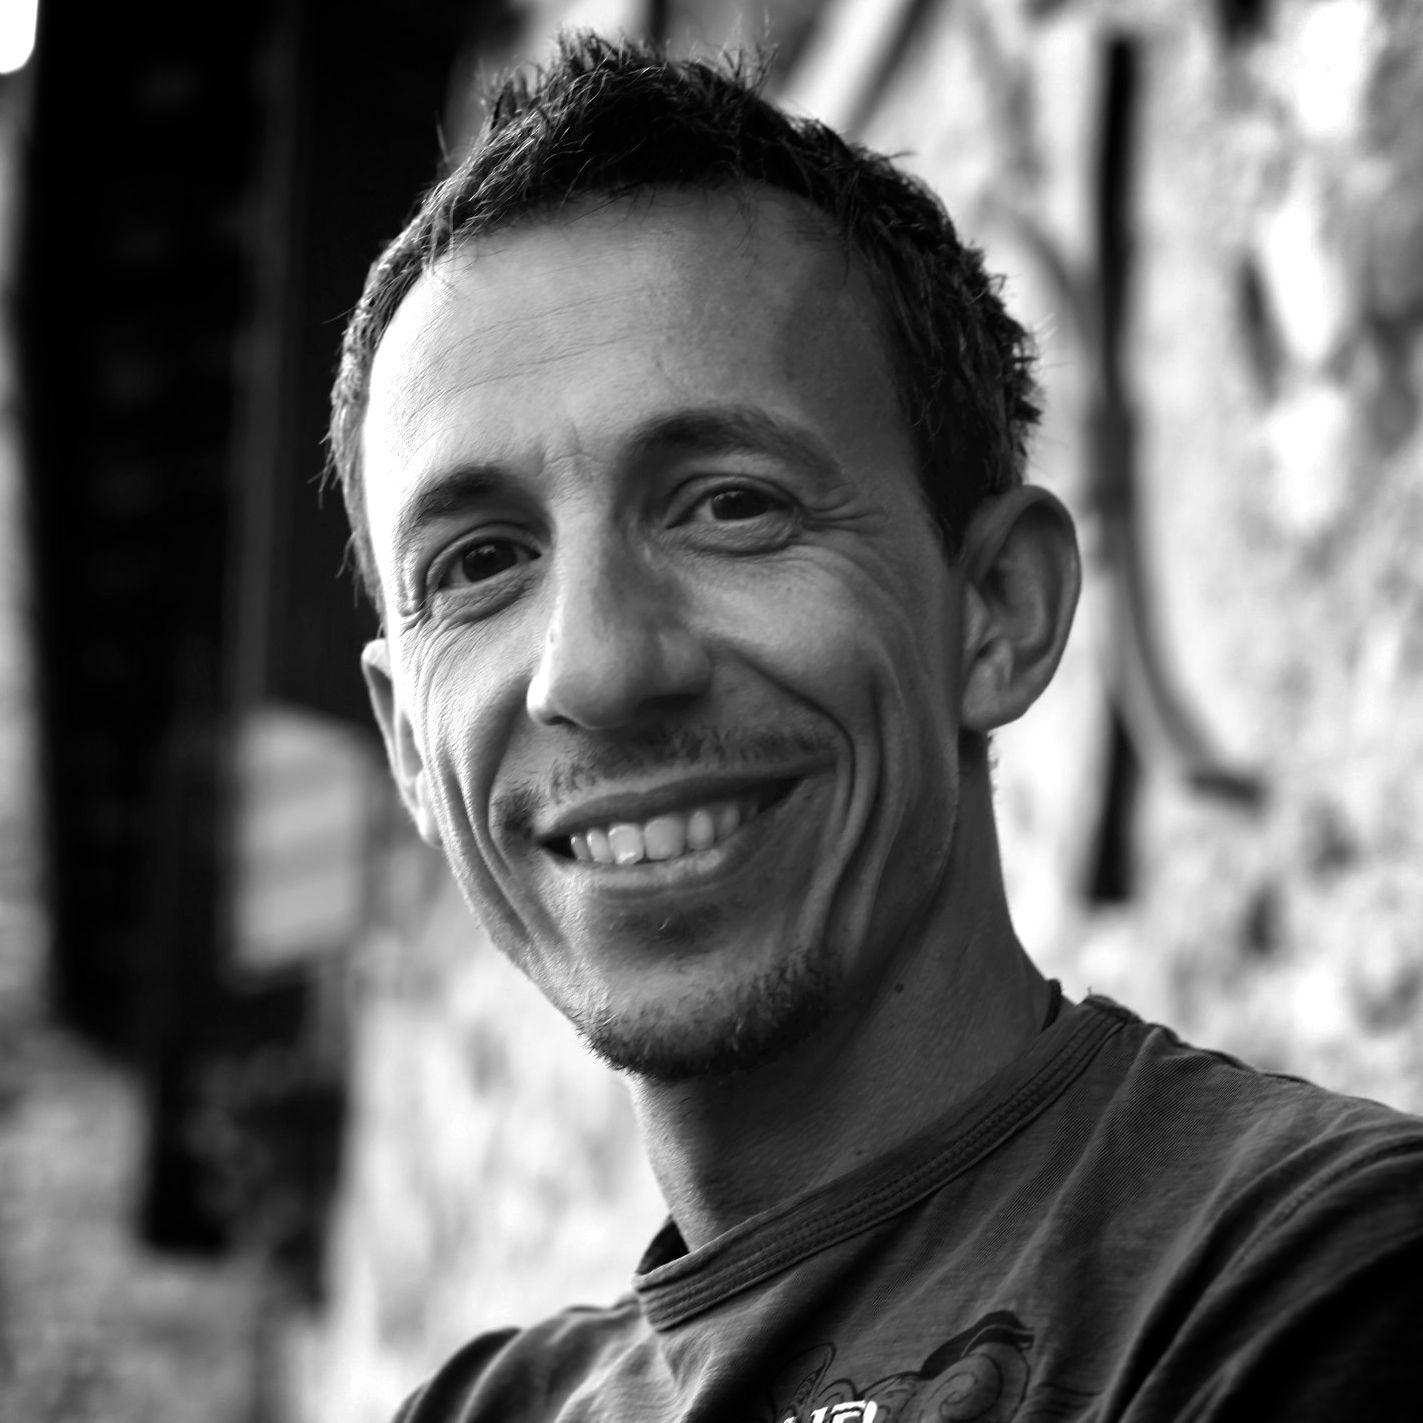 Vitùc, Luxembourg-born Italian filmmaker, poet, photographer. Photo credit: courtesy of the artist.